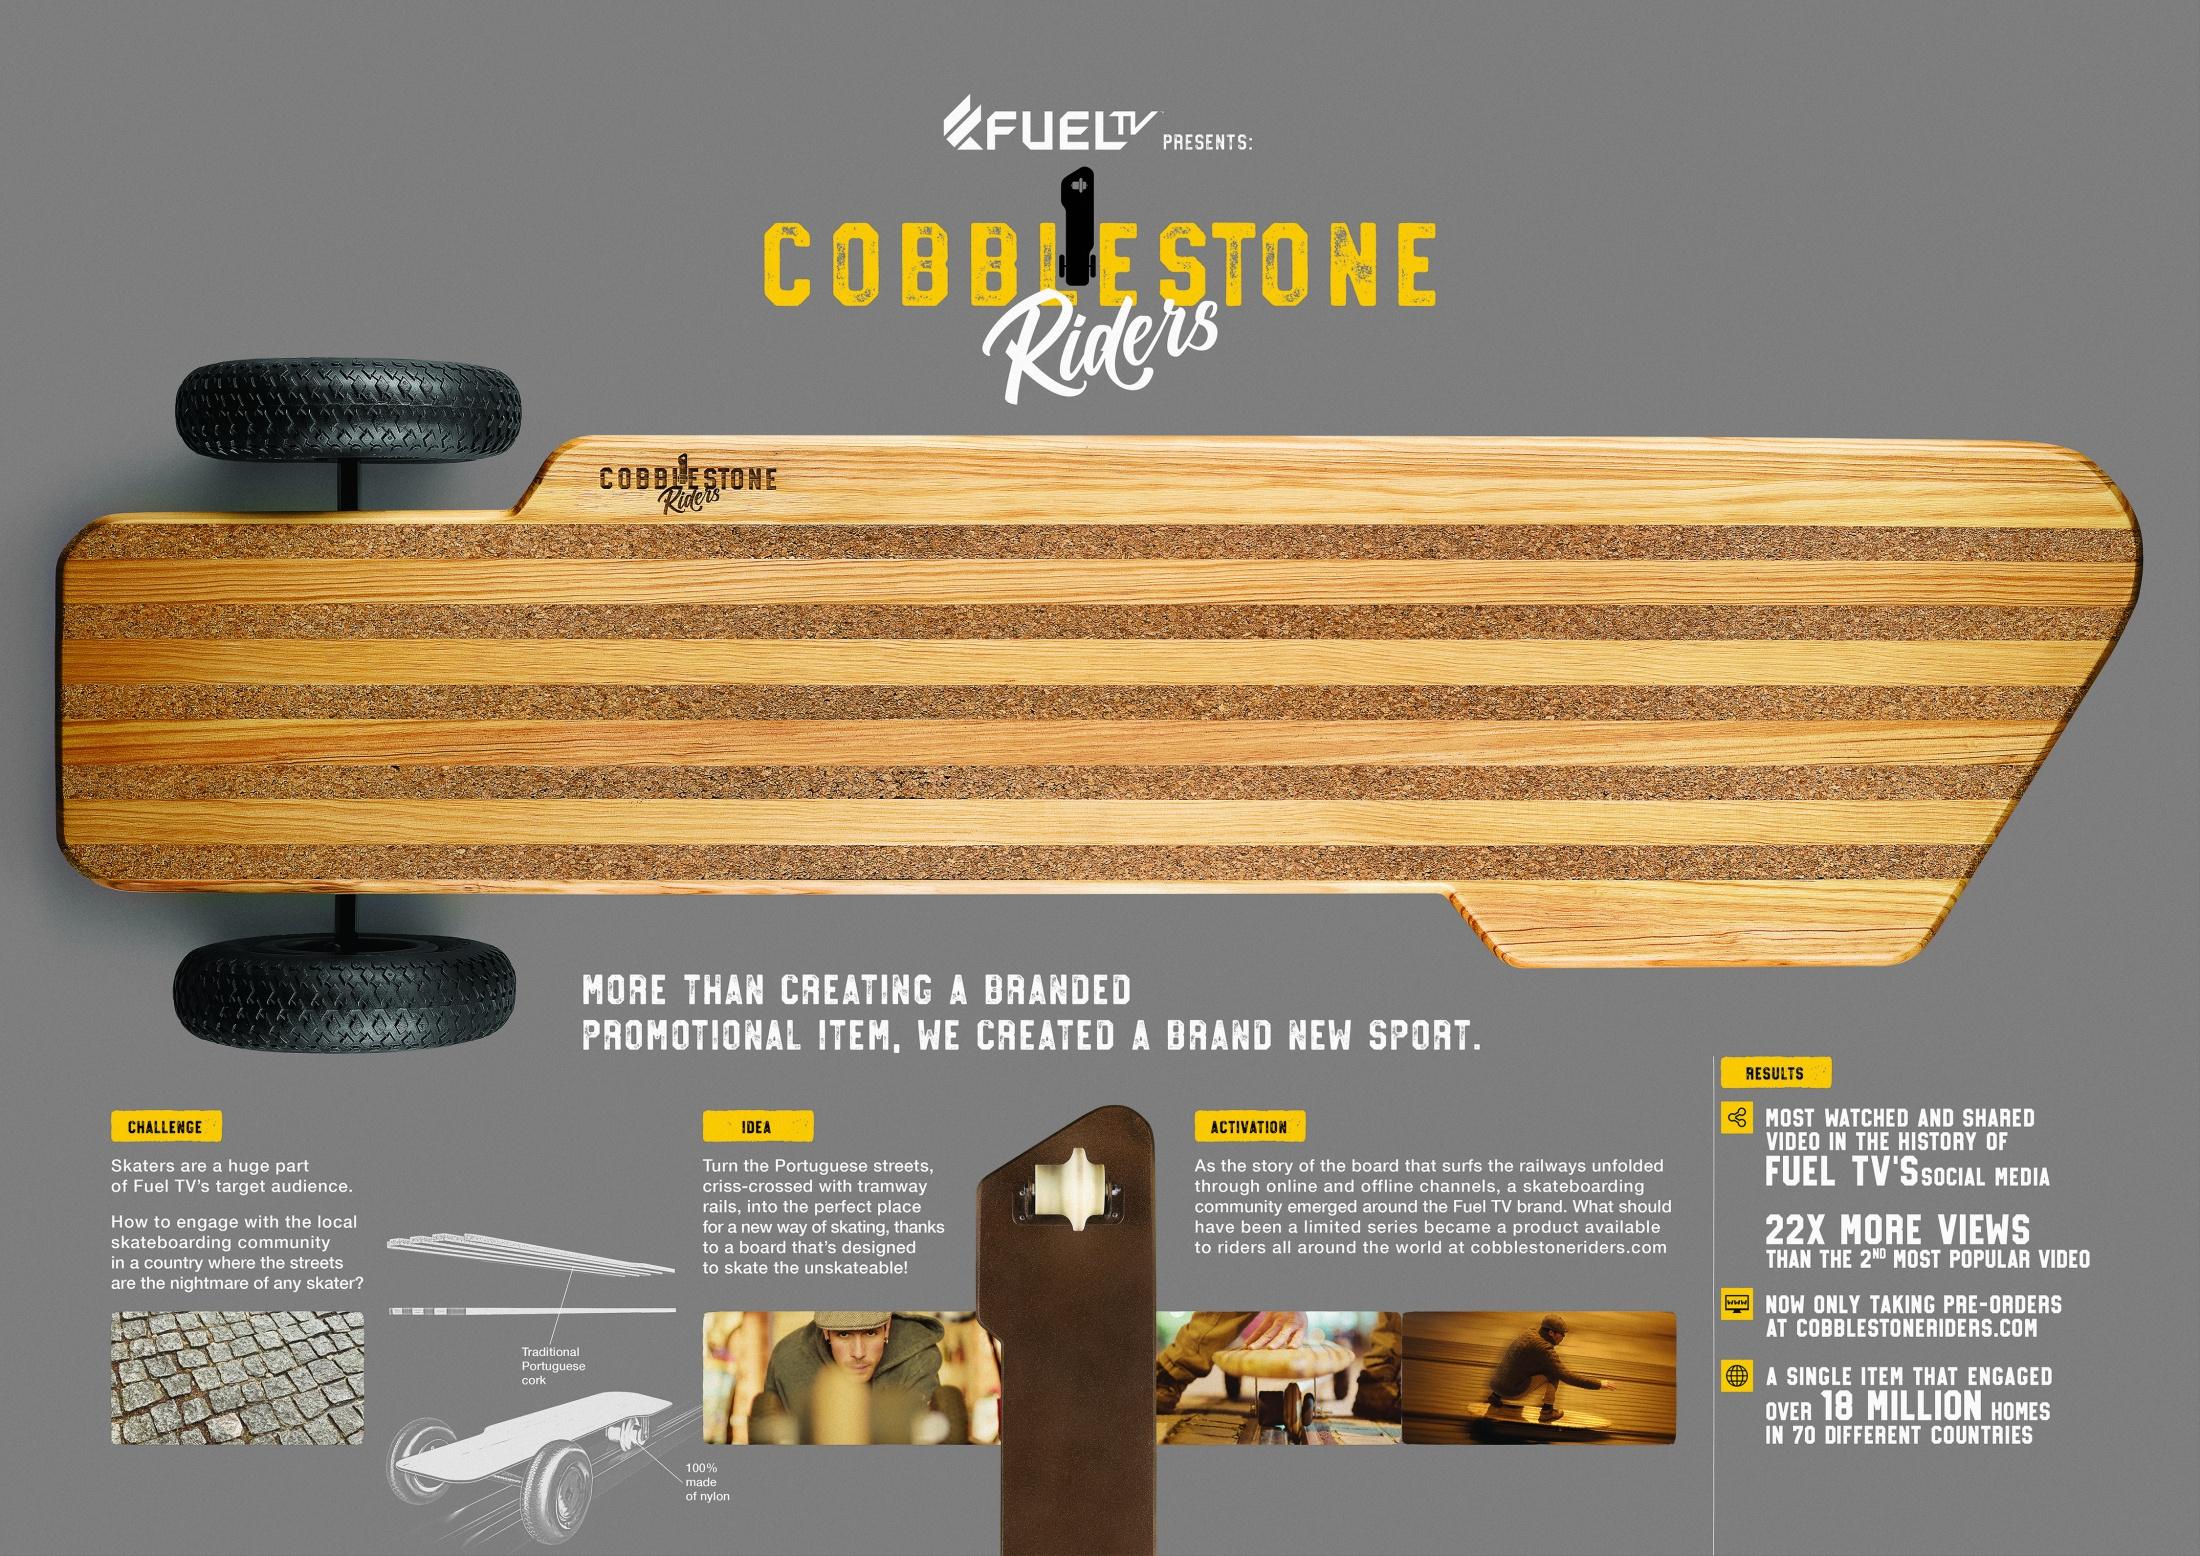 Thumbnail for COBBLESTONE RIDERS